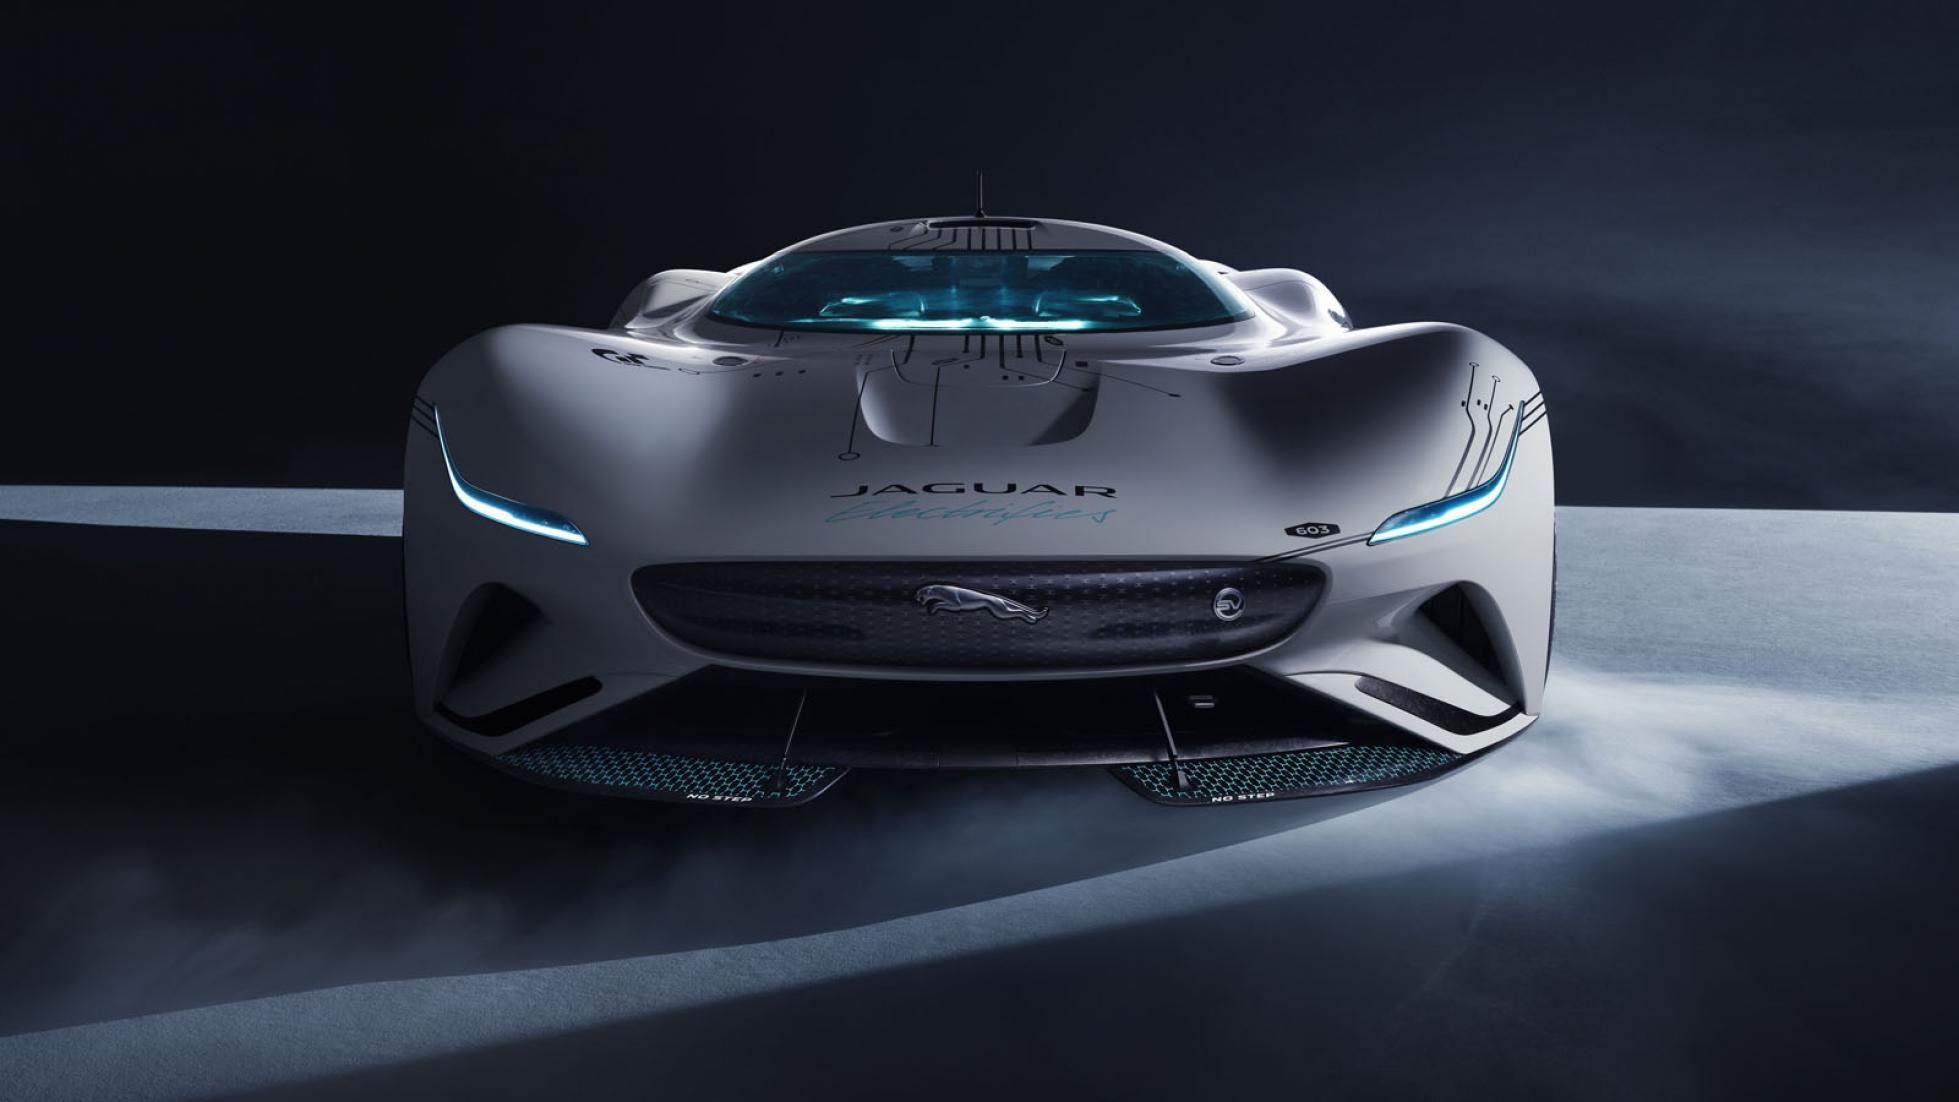 Jaguar Vision GT SV 5 carro elétrico, Gran Turismo, Gran Turismo Sport, GT, Jaguar, Jaguar Vision GT SV